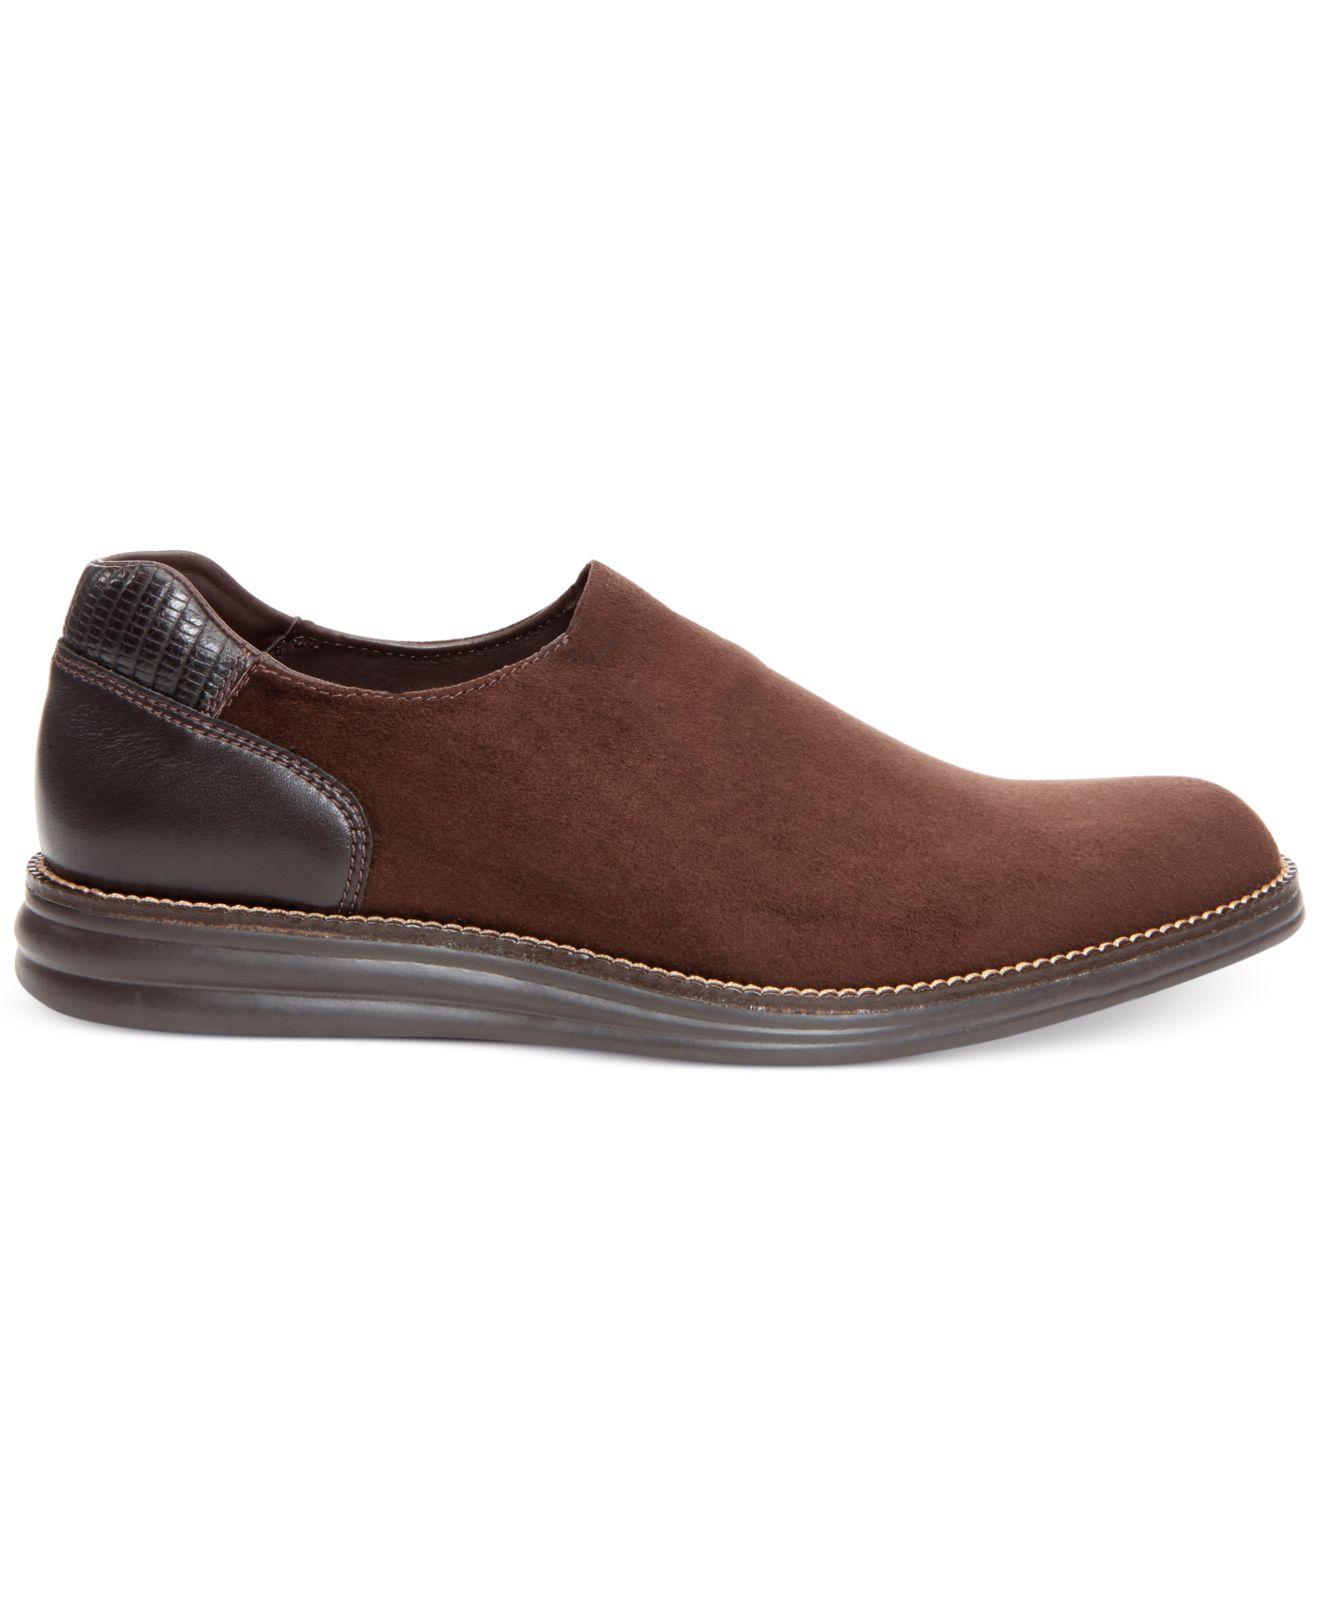 donald j pliner erling casual slip on shoes in brown for